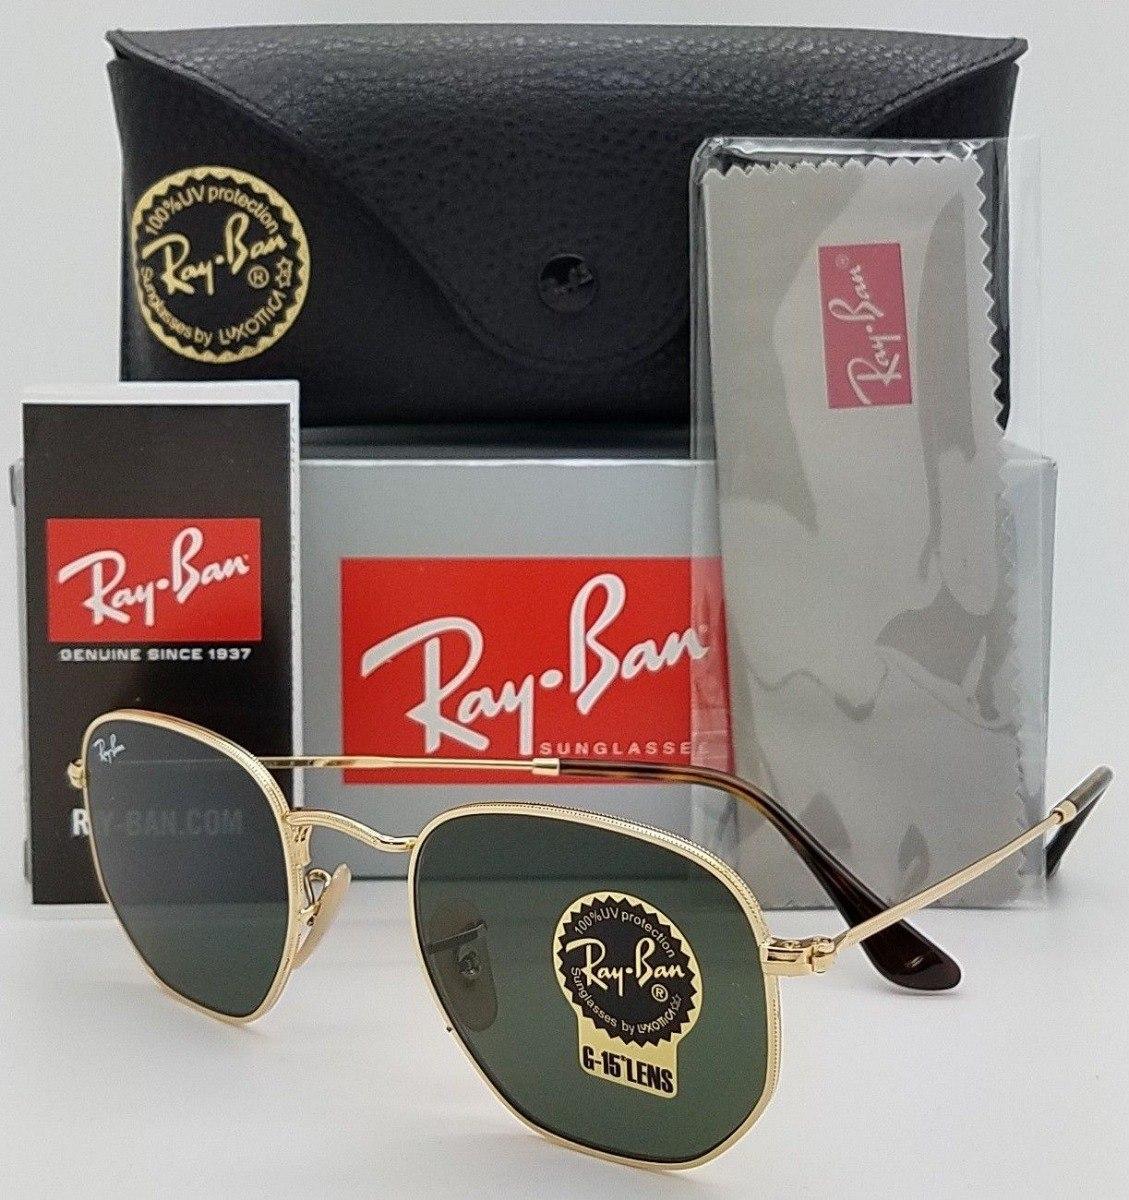 Oculos De Sol Ray Ban Hexagonal Rb3548 Grande 54mm G15 - R  300,00 ... deddda9536